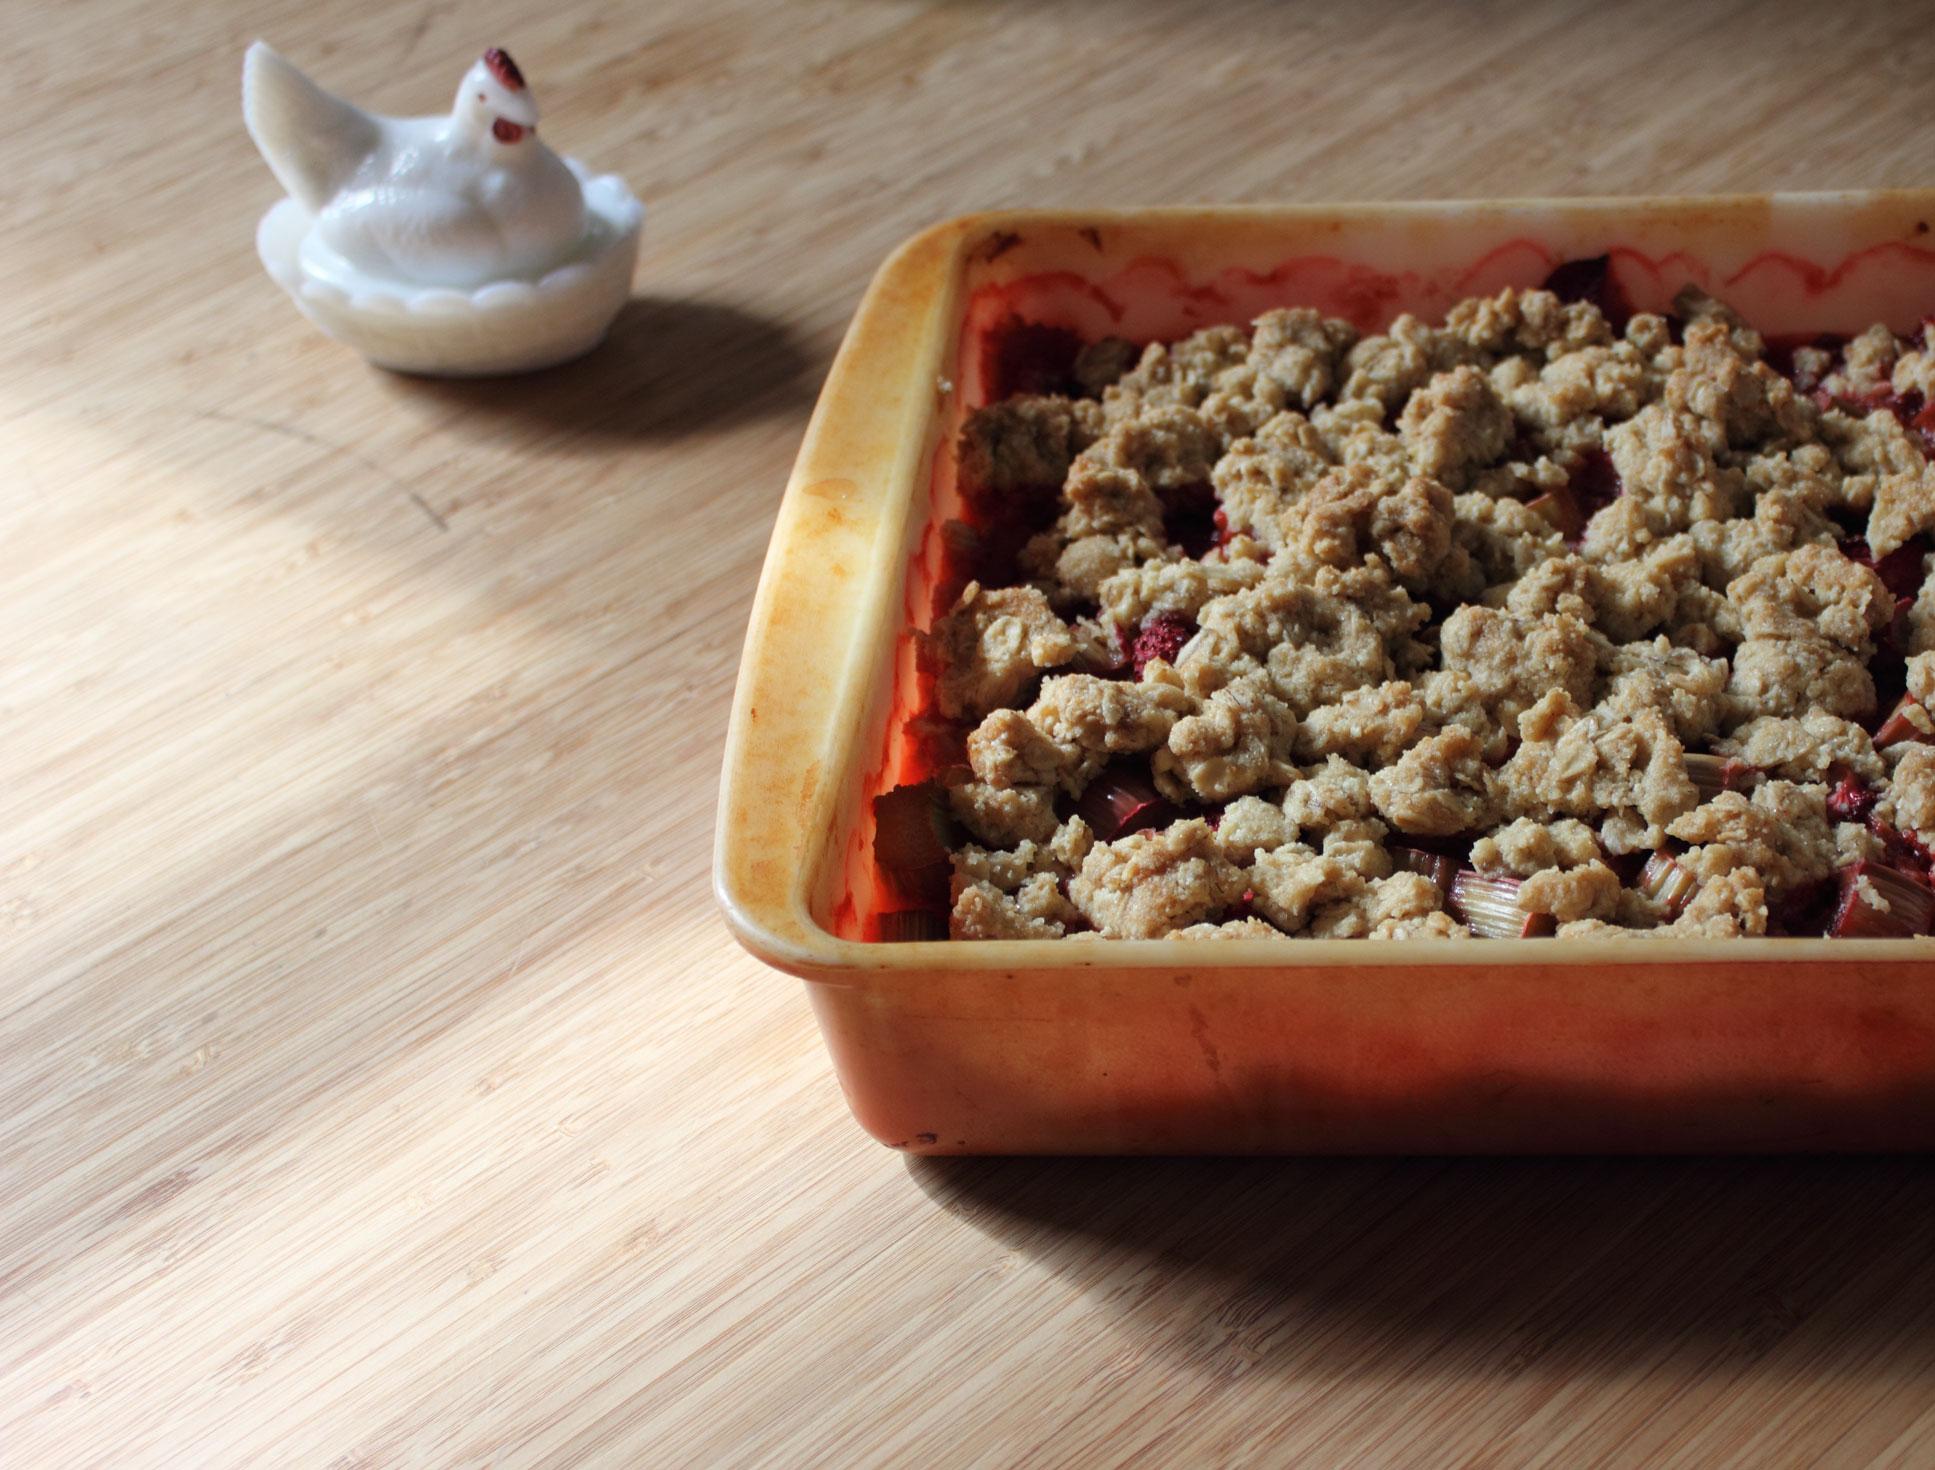 Gluten-free Strawberry Rhubarb Crisp